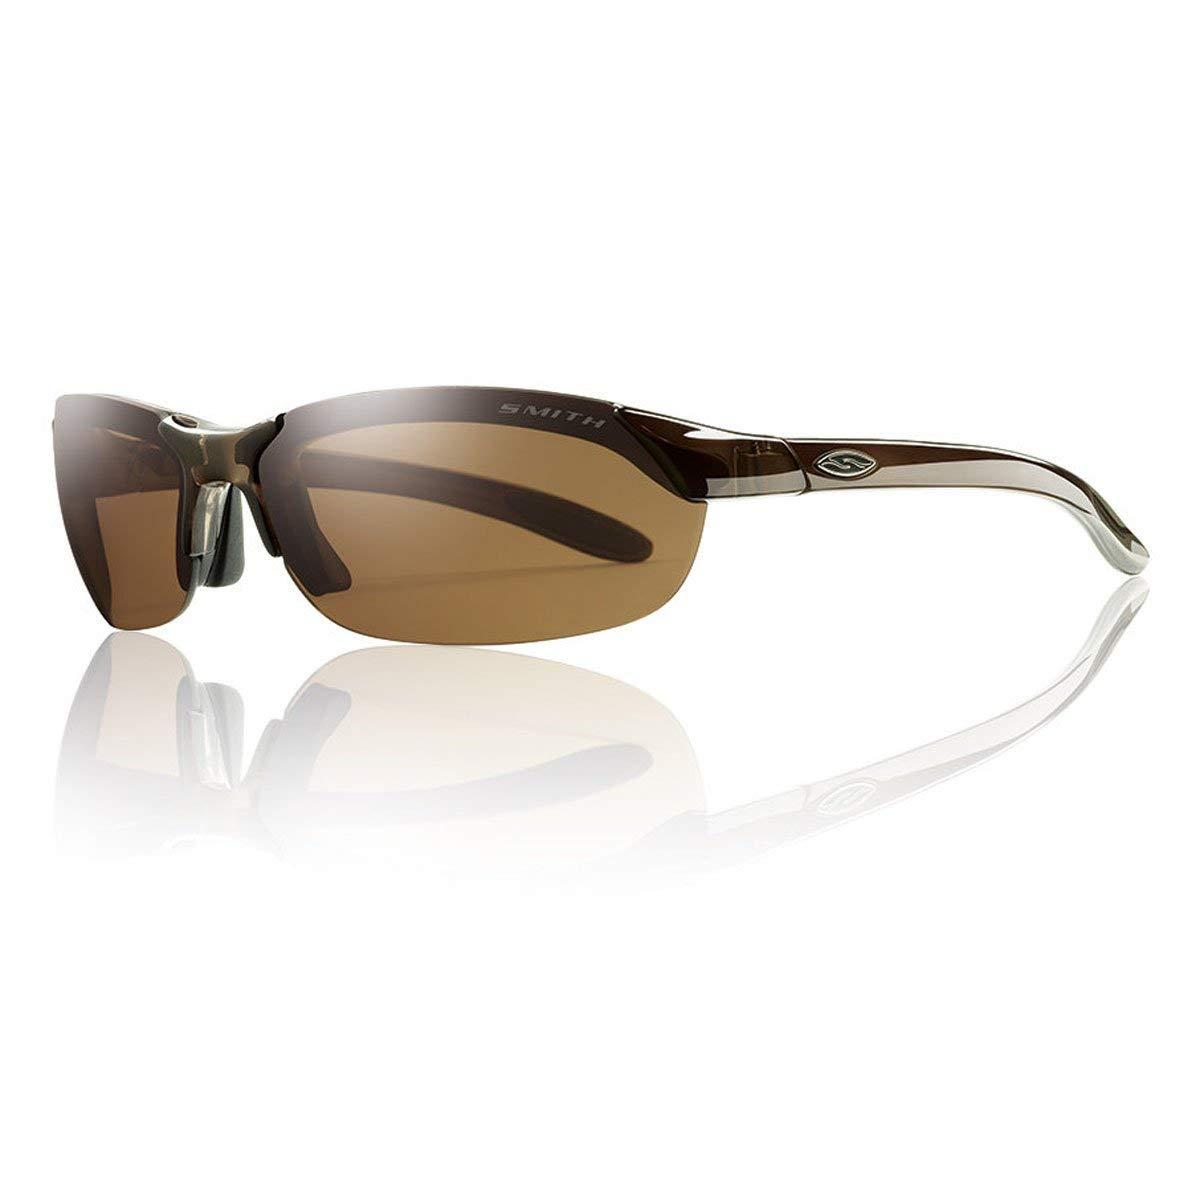 08f4c2ec0f Smith Optics Smith Women s Parallel Sunglasses